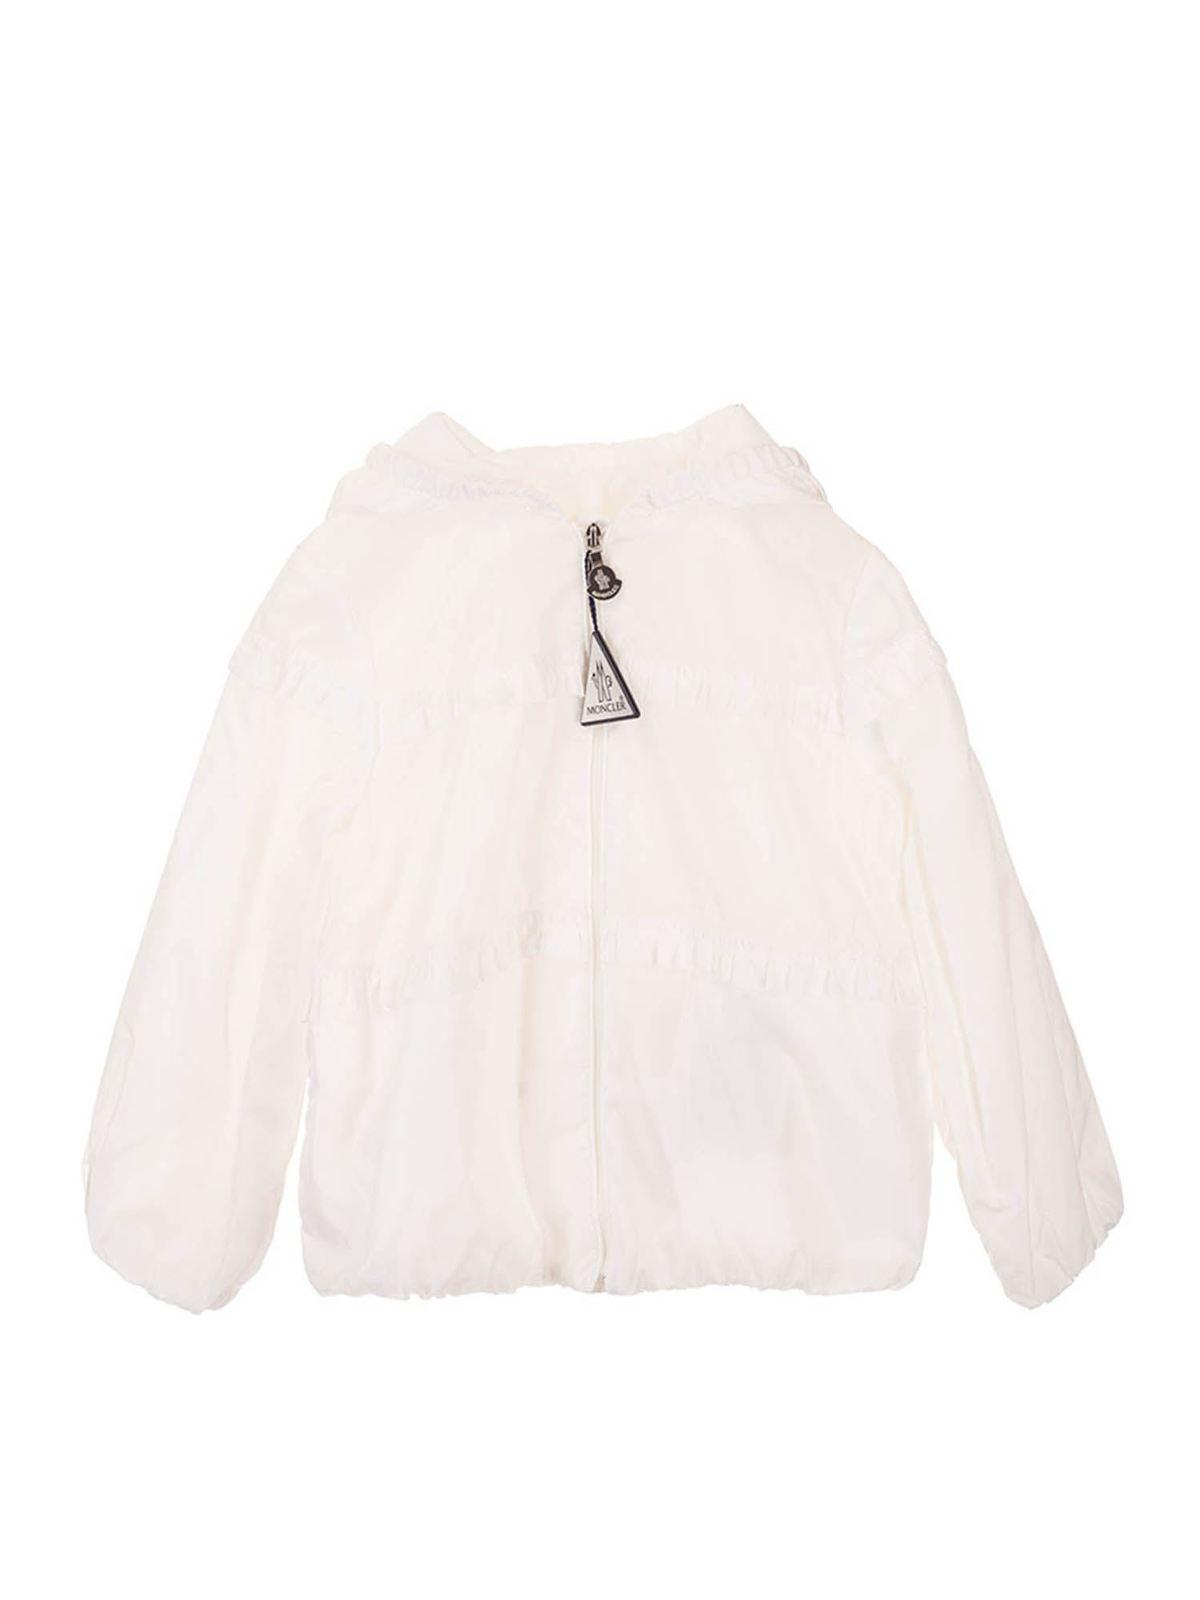 Moncler Jr Kids' Hiti Jacket  In White